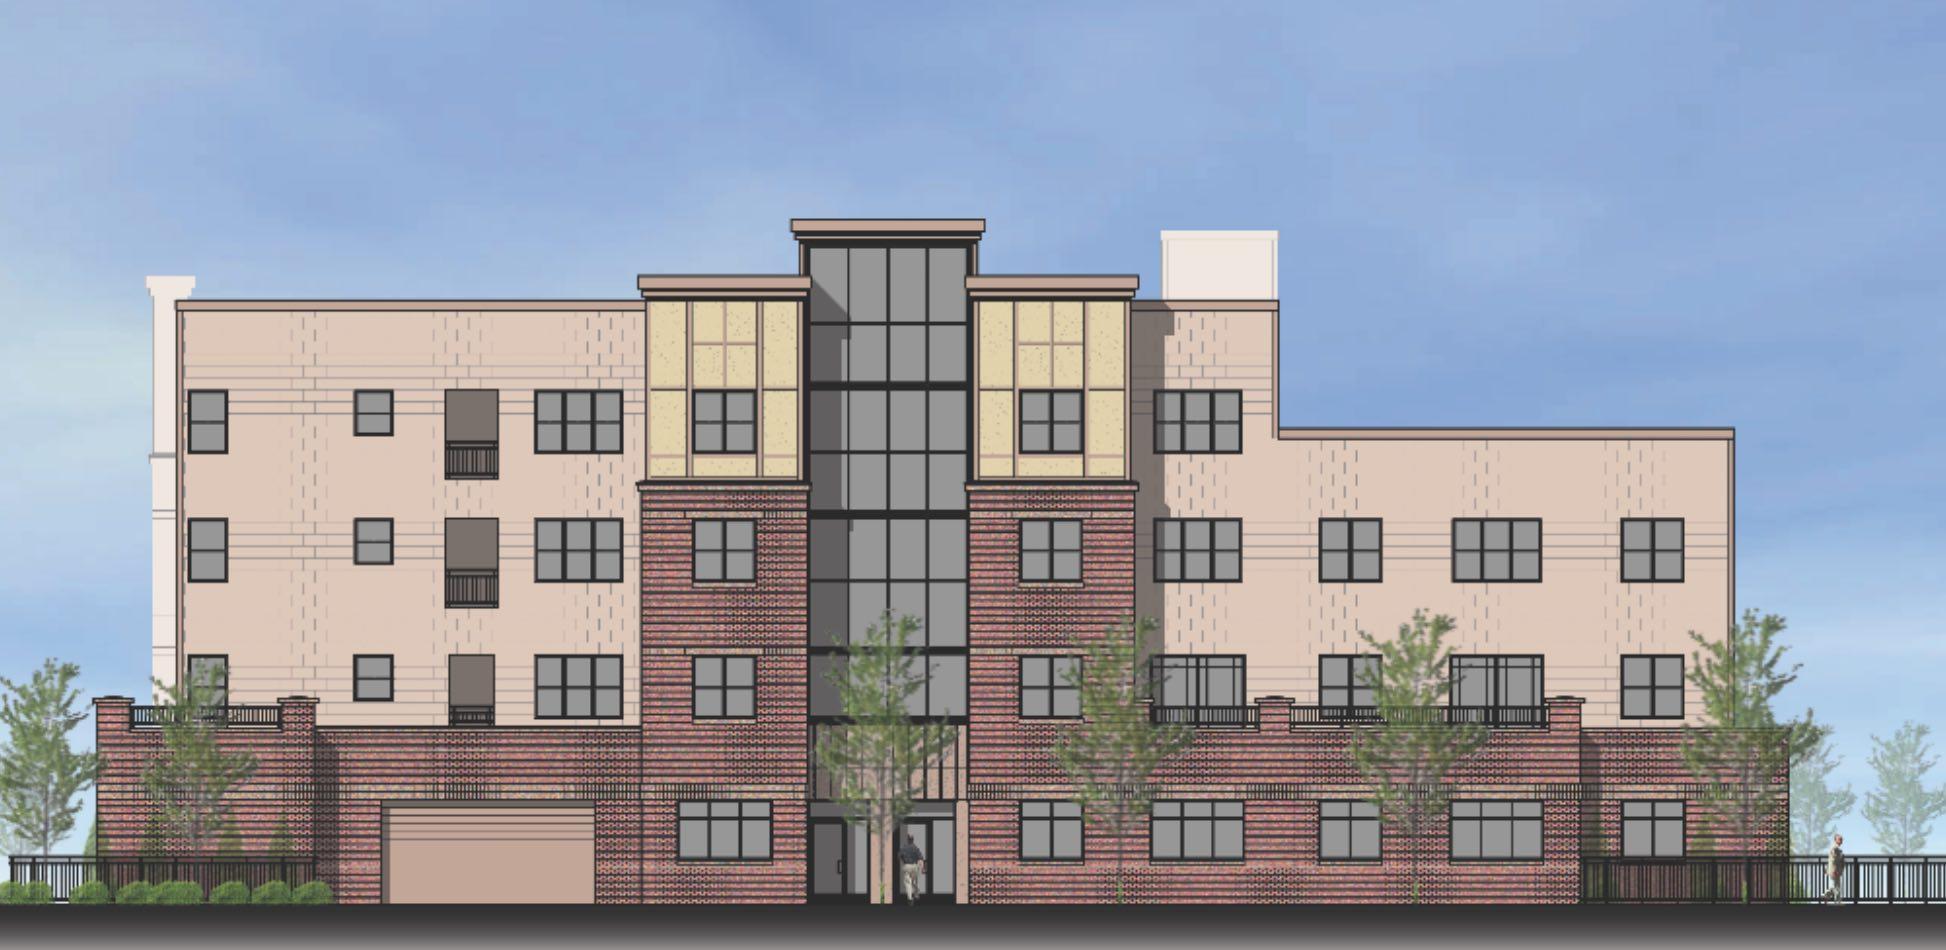 13 shetland street roxbury boston proposed residential apartment development the holland companies vmy architects